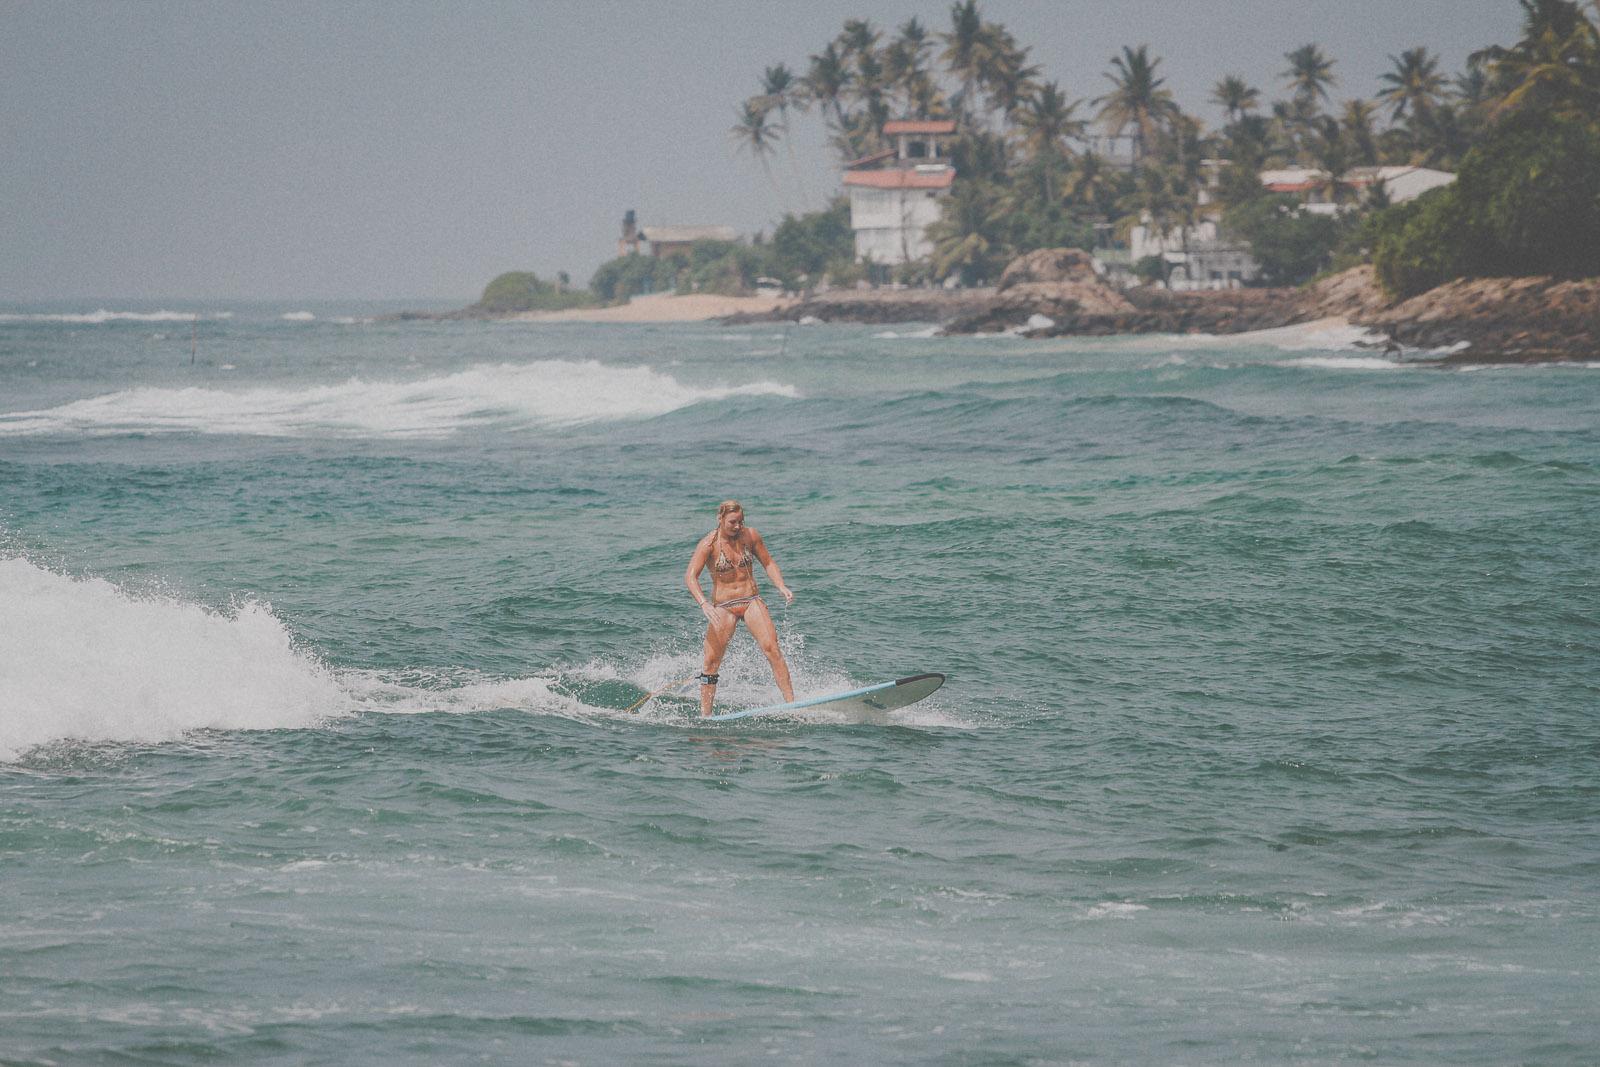 Sri Lanka-Lazy Left-Rams-Midigama-Surfing-Surf-Wave-Pointbreak-Longboard-Sunshinestories-IMG_4352